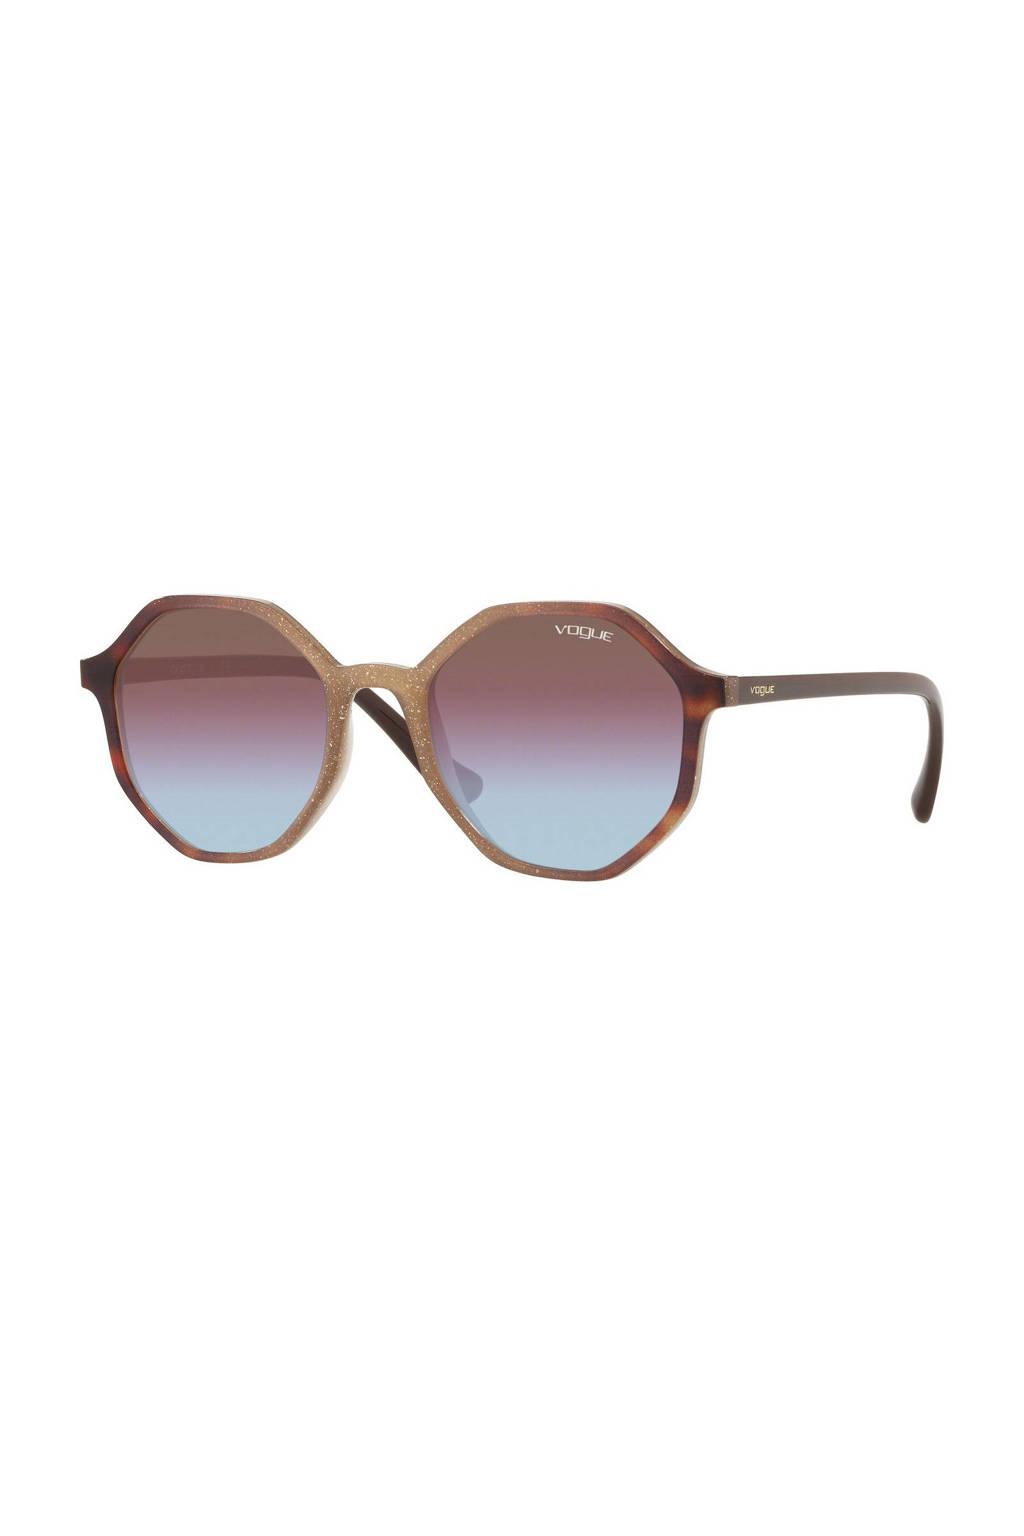 Vogue zonnebril 0VO5222S